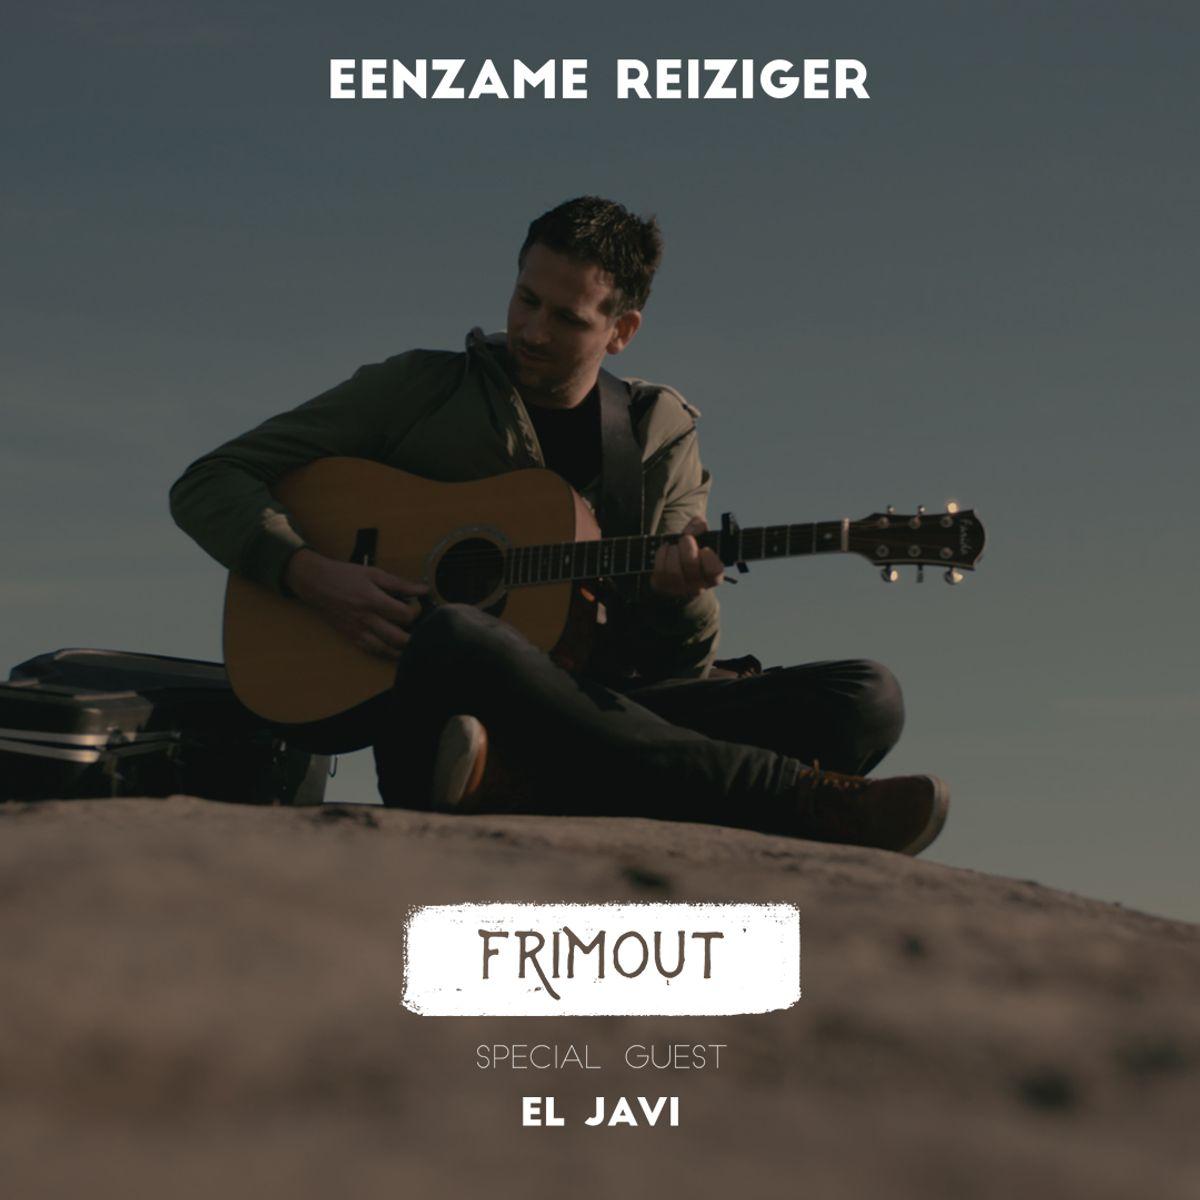 Frimout - Eenzame reiziger